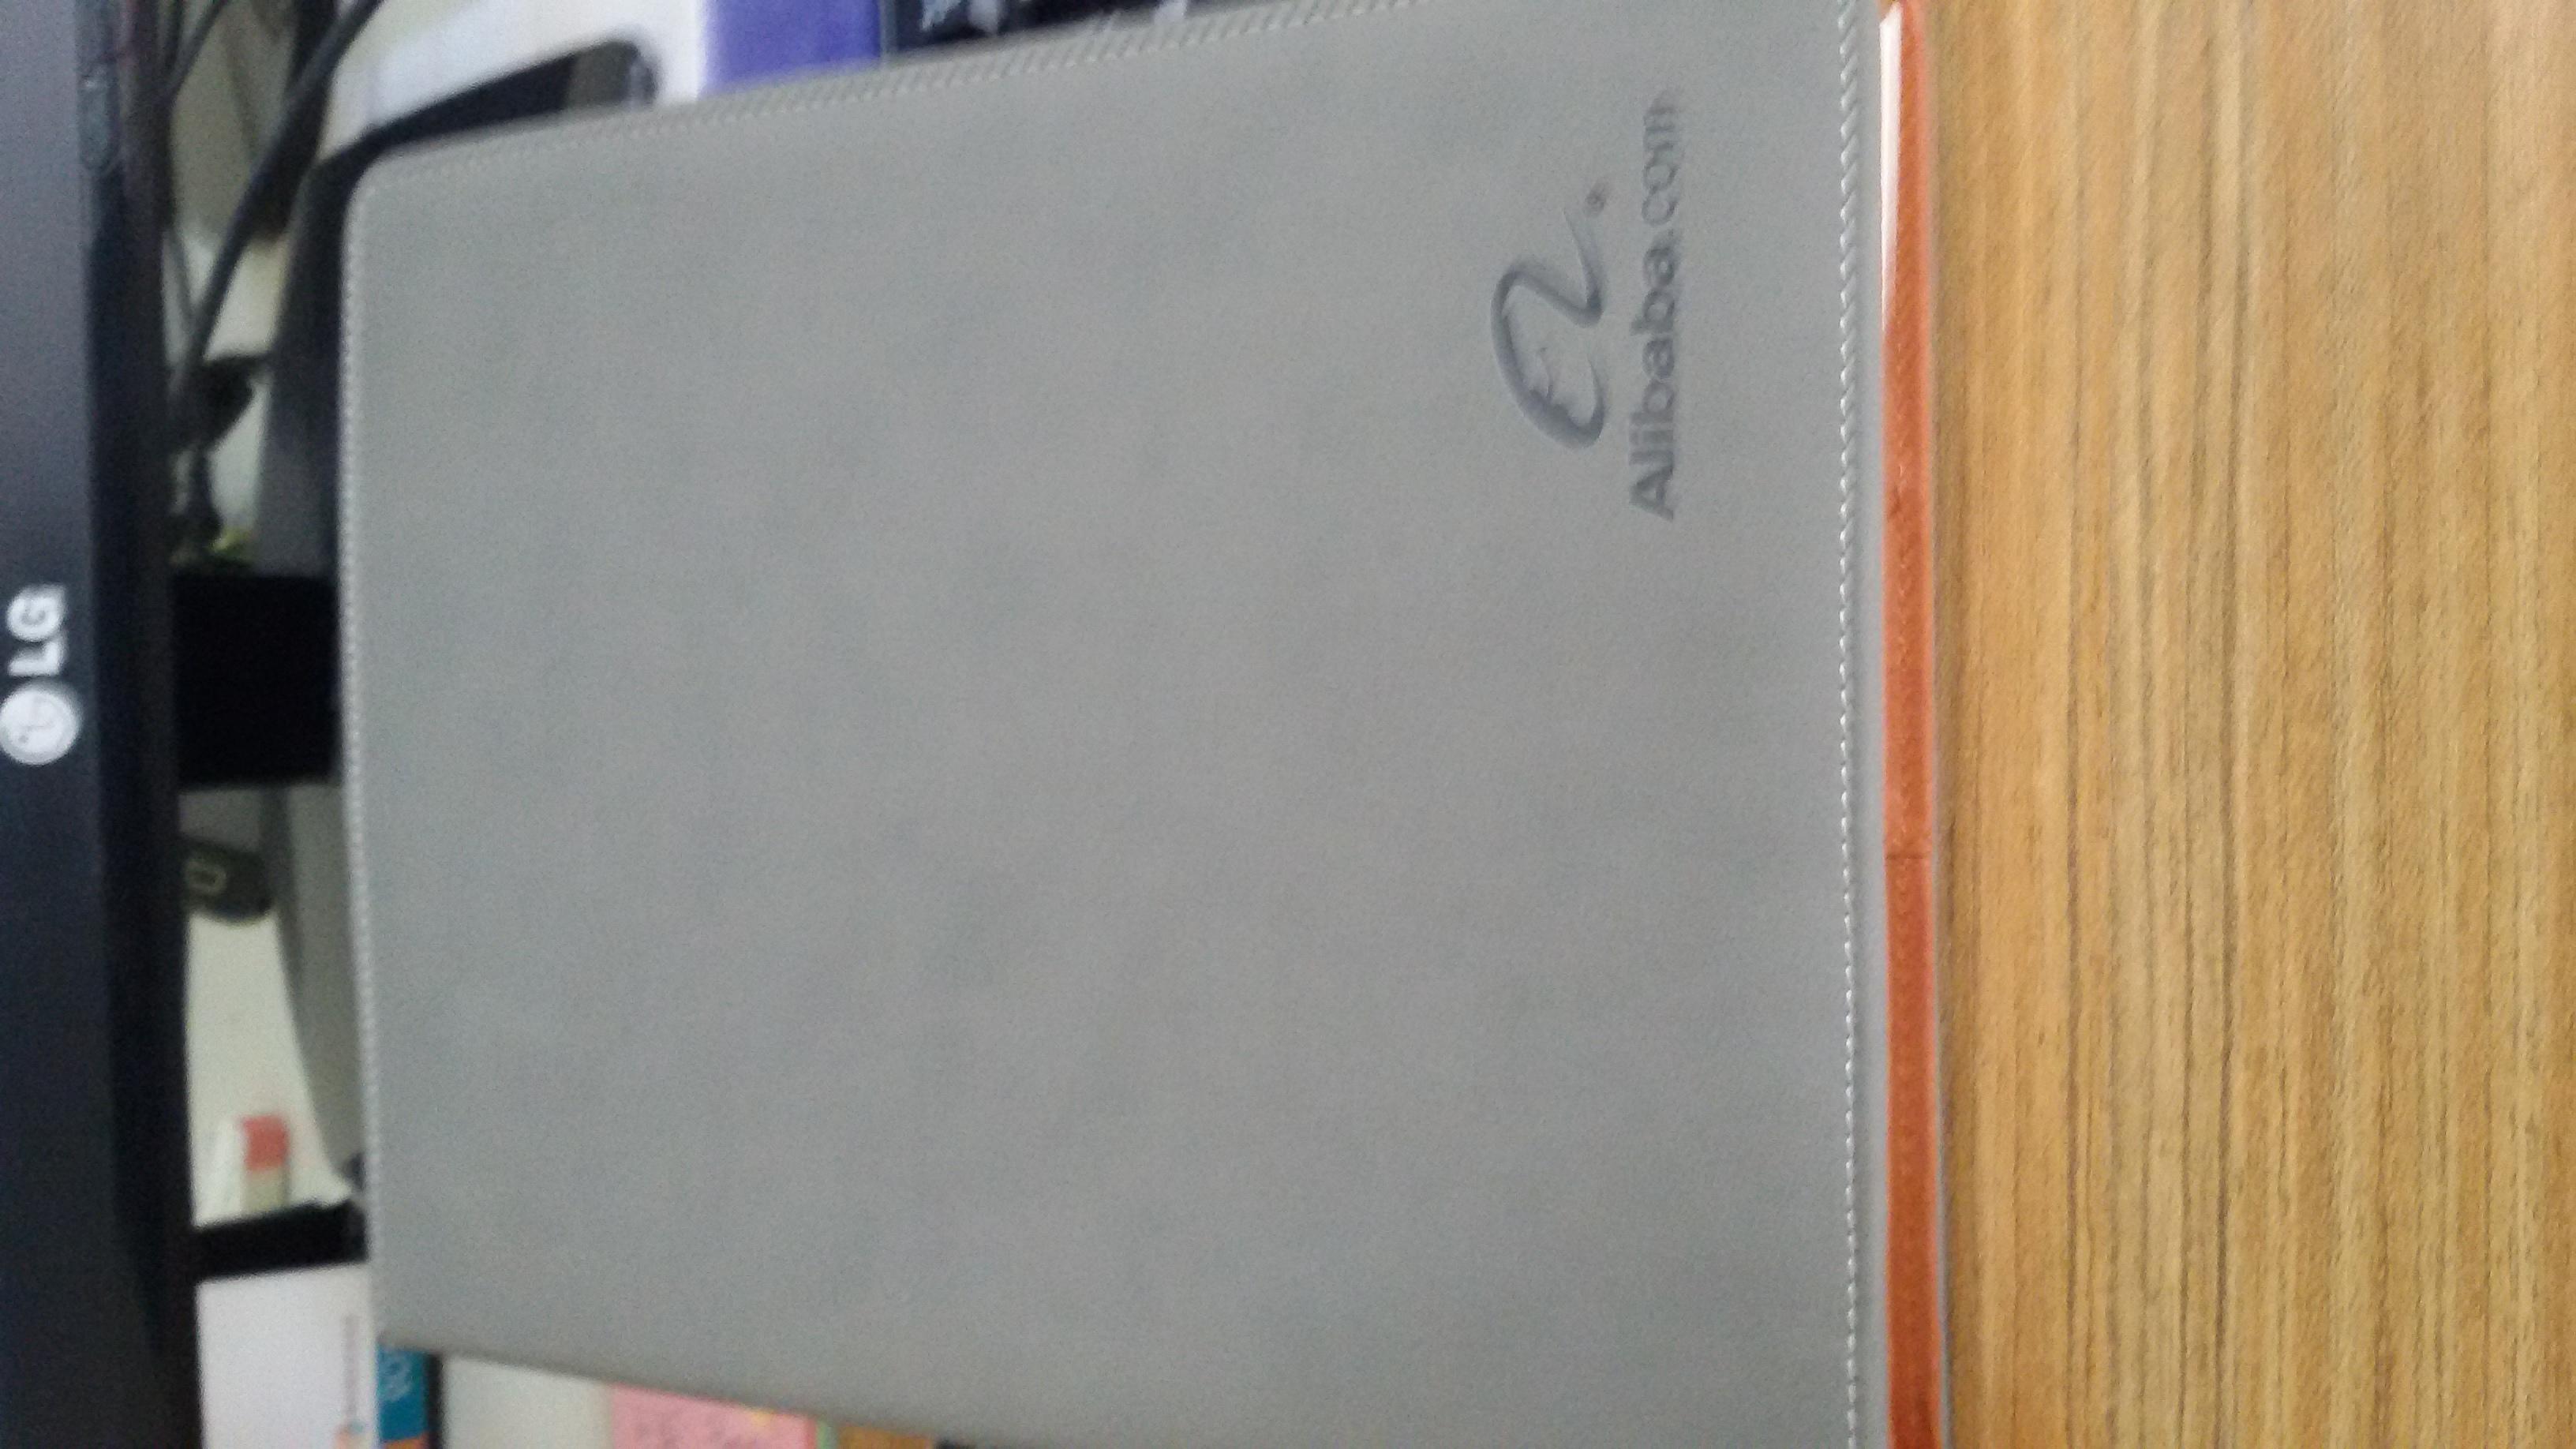 阿牛笔记本-1